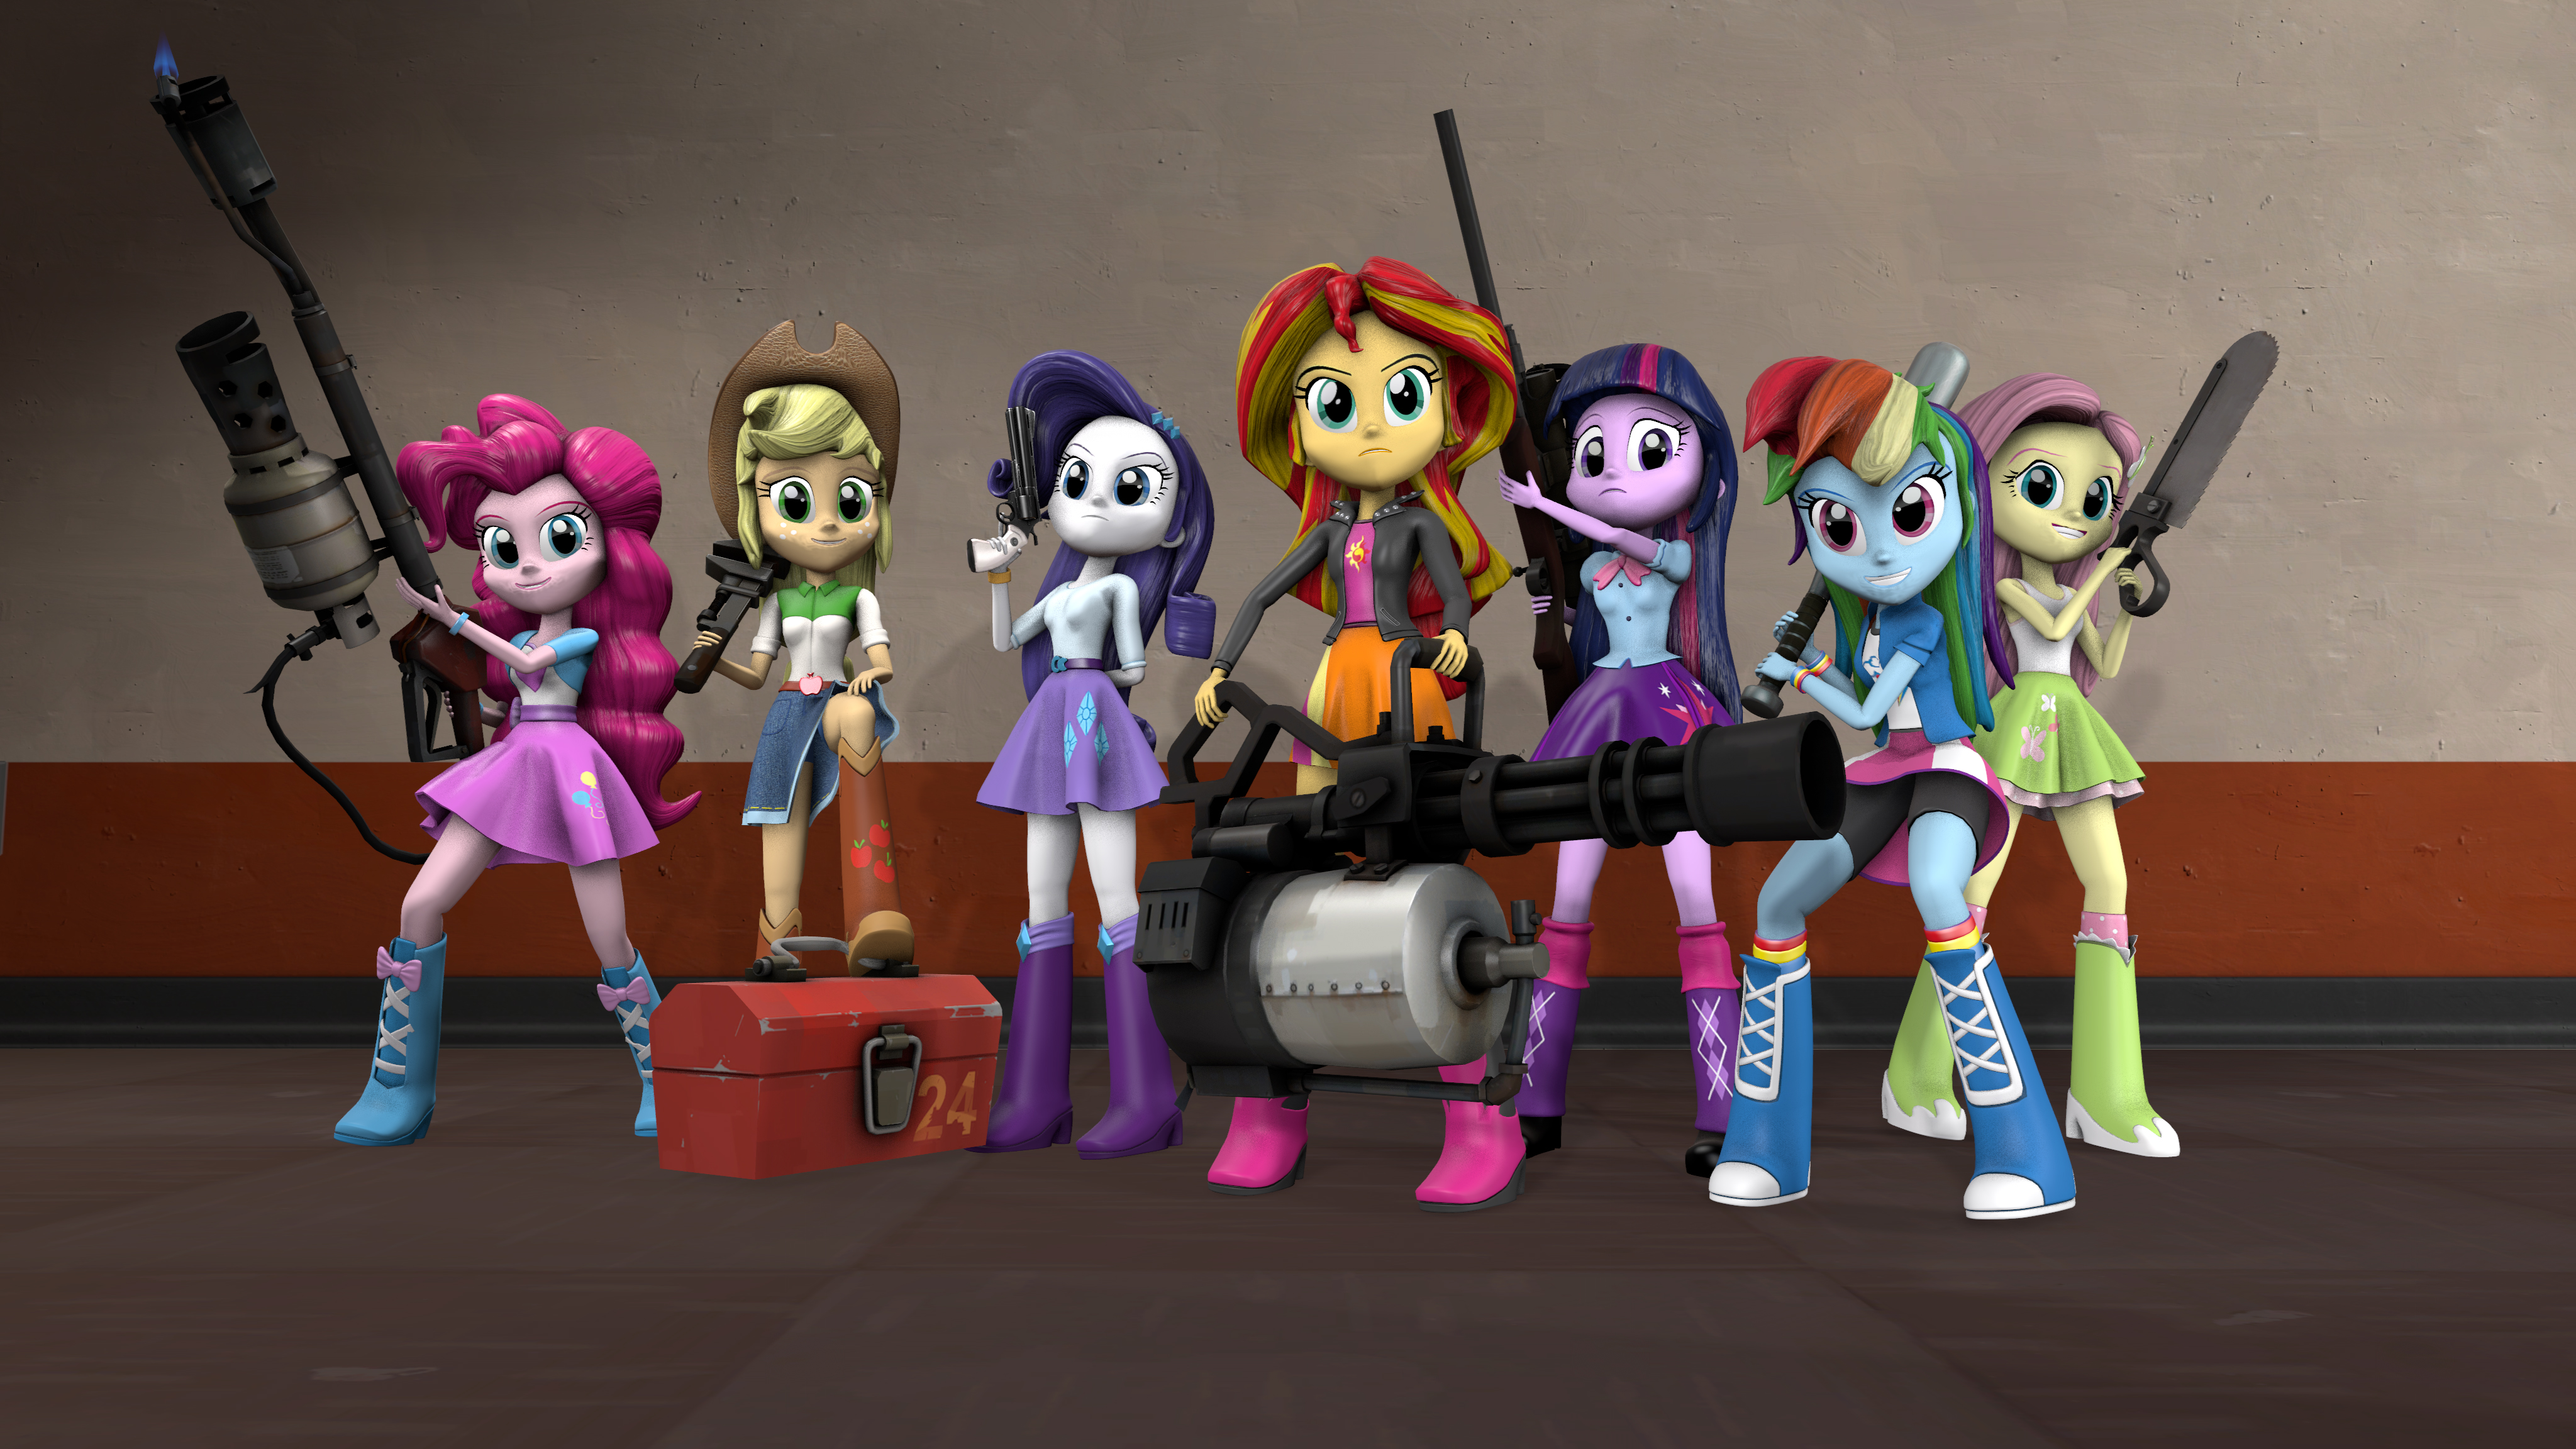 Dazzlings Human or Pony - Versus Ponyville - Ponyville net